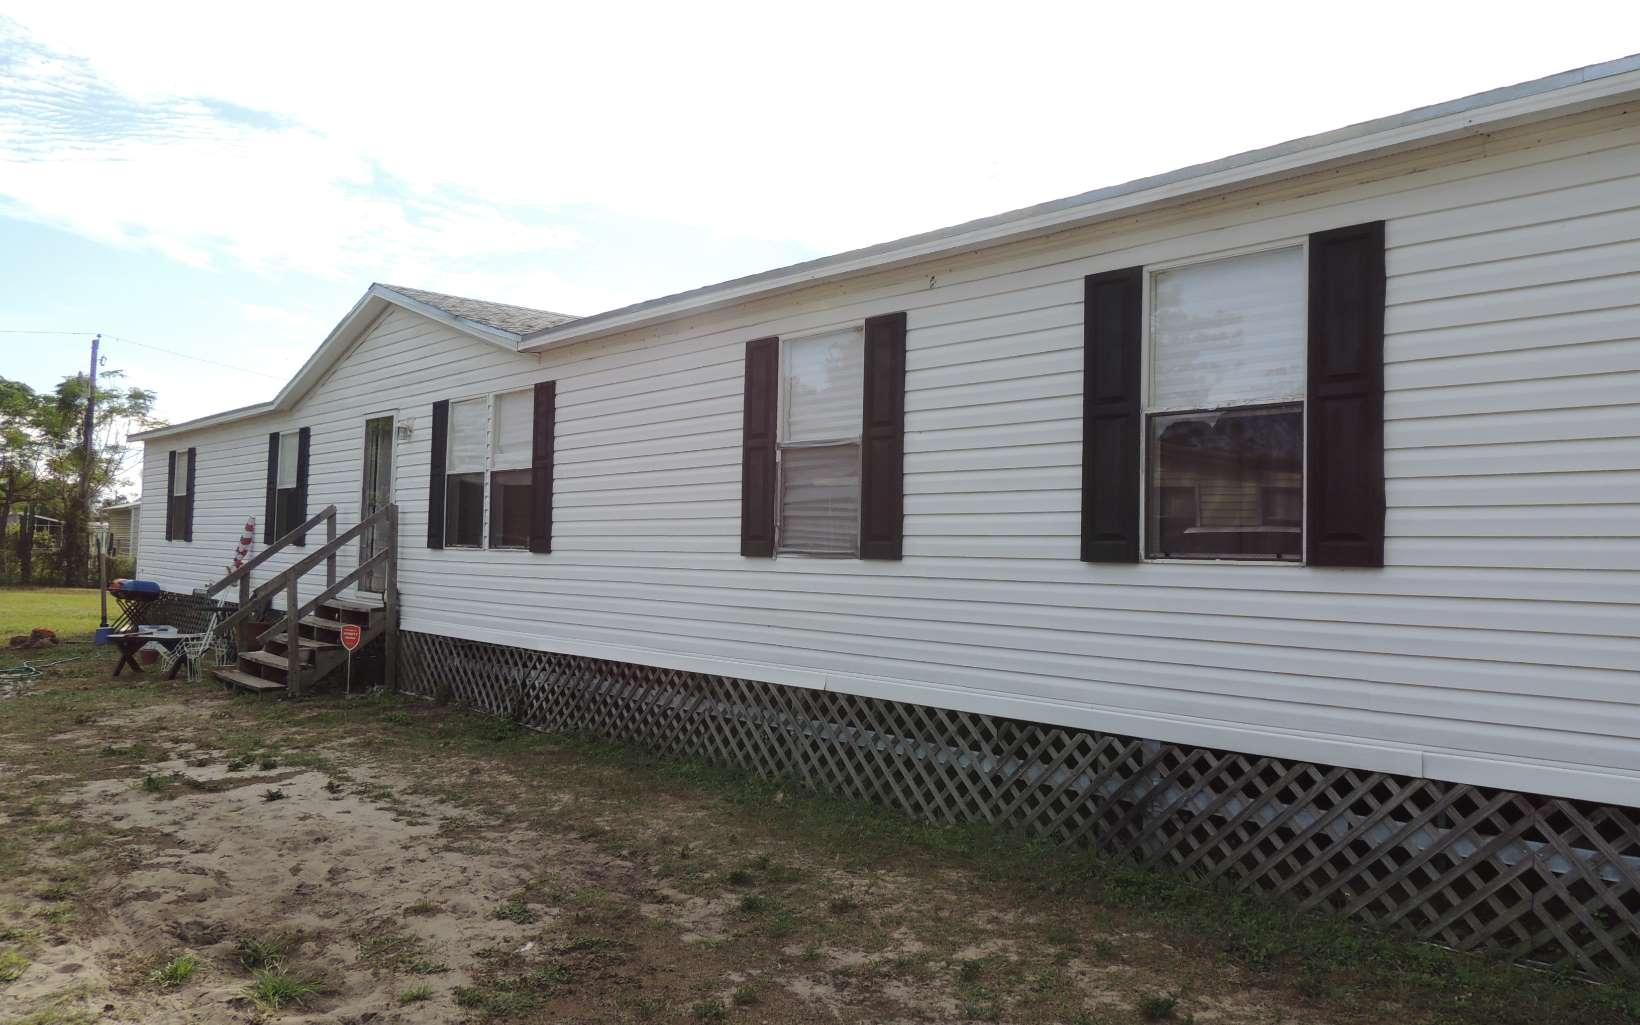 3105 Avery Ct, Sebring, FL 33870